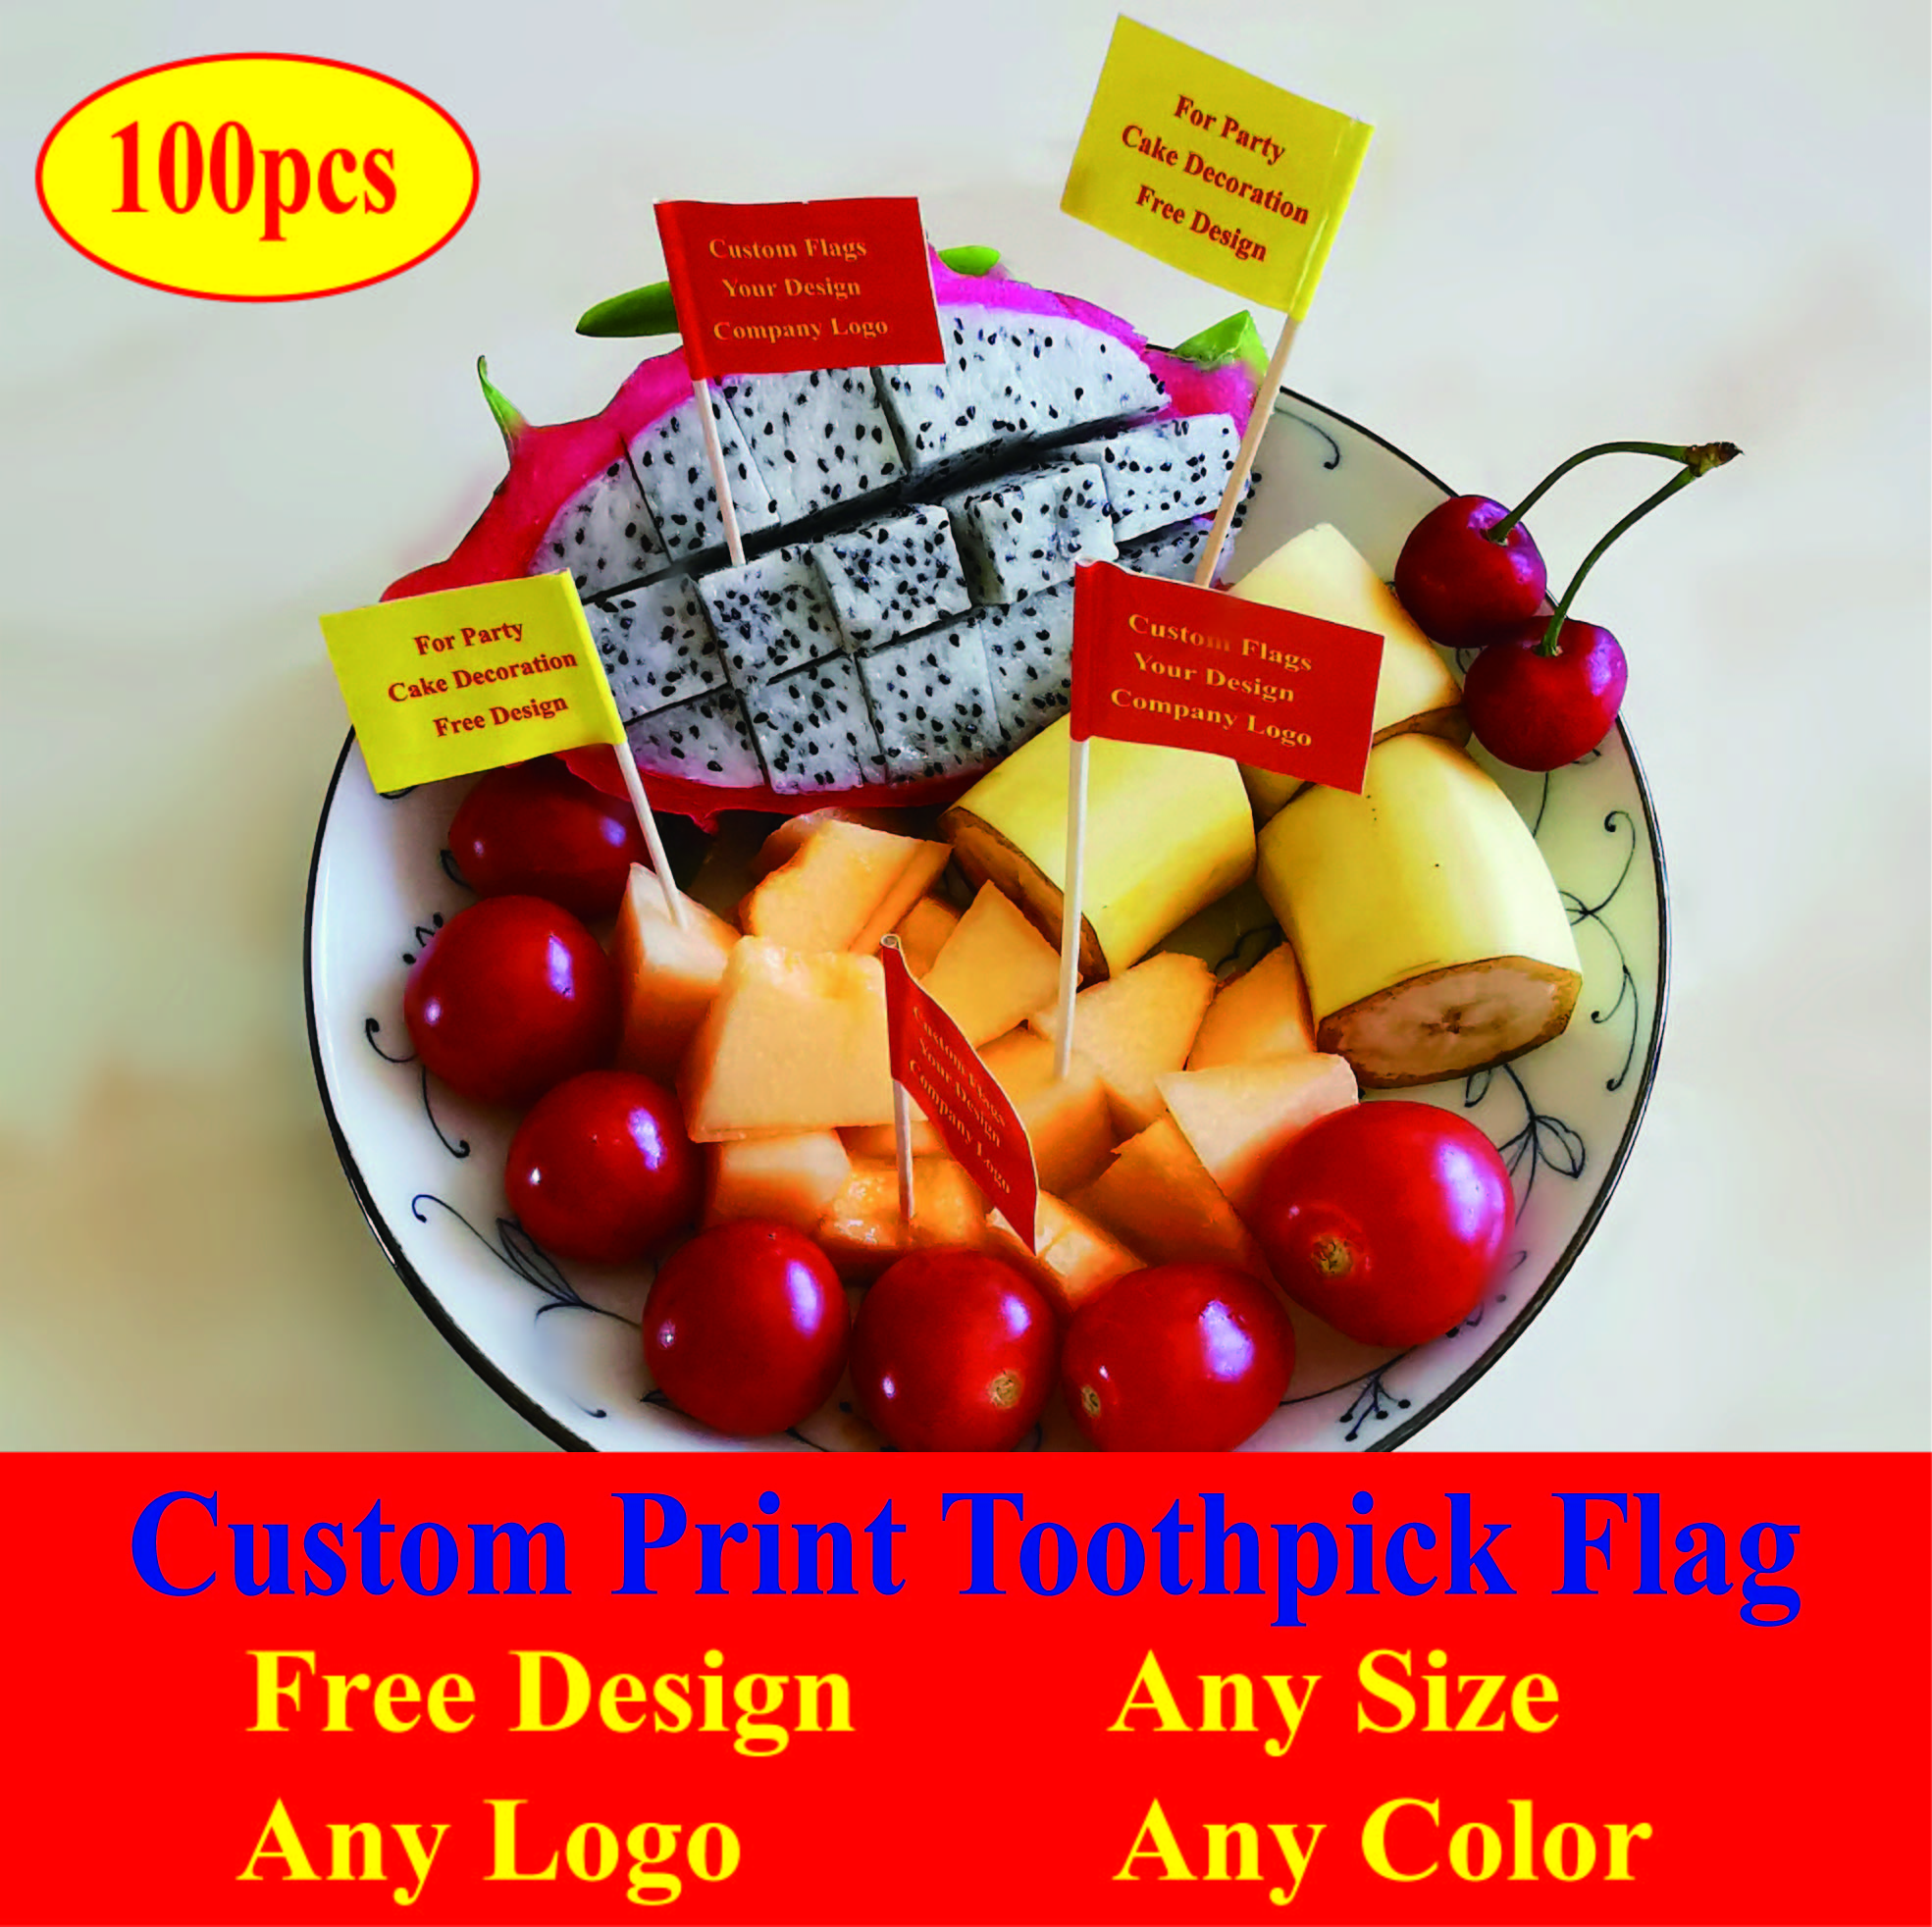 Custom Flag Logo Toothpick Flags Double Side Flag Food Picks Cake Toppers Fruit Cocktail Sticks Flag Free Design 100pcs/bag(China)